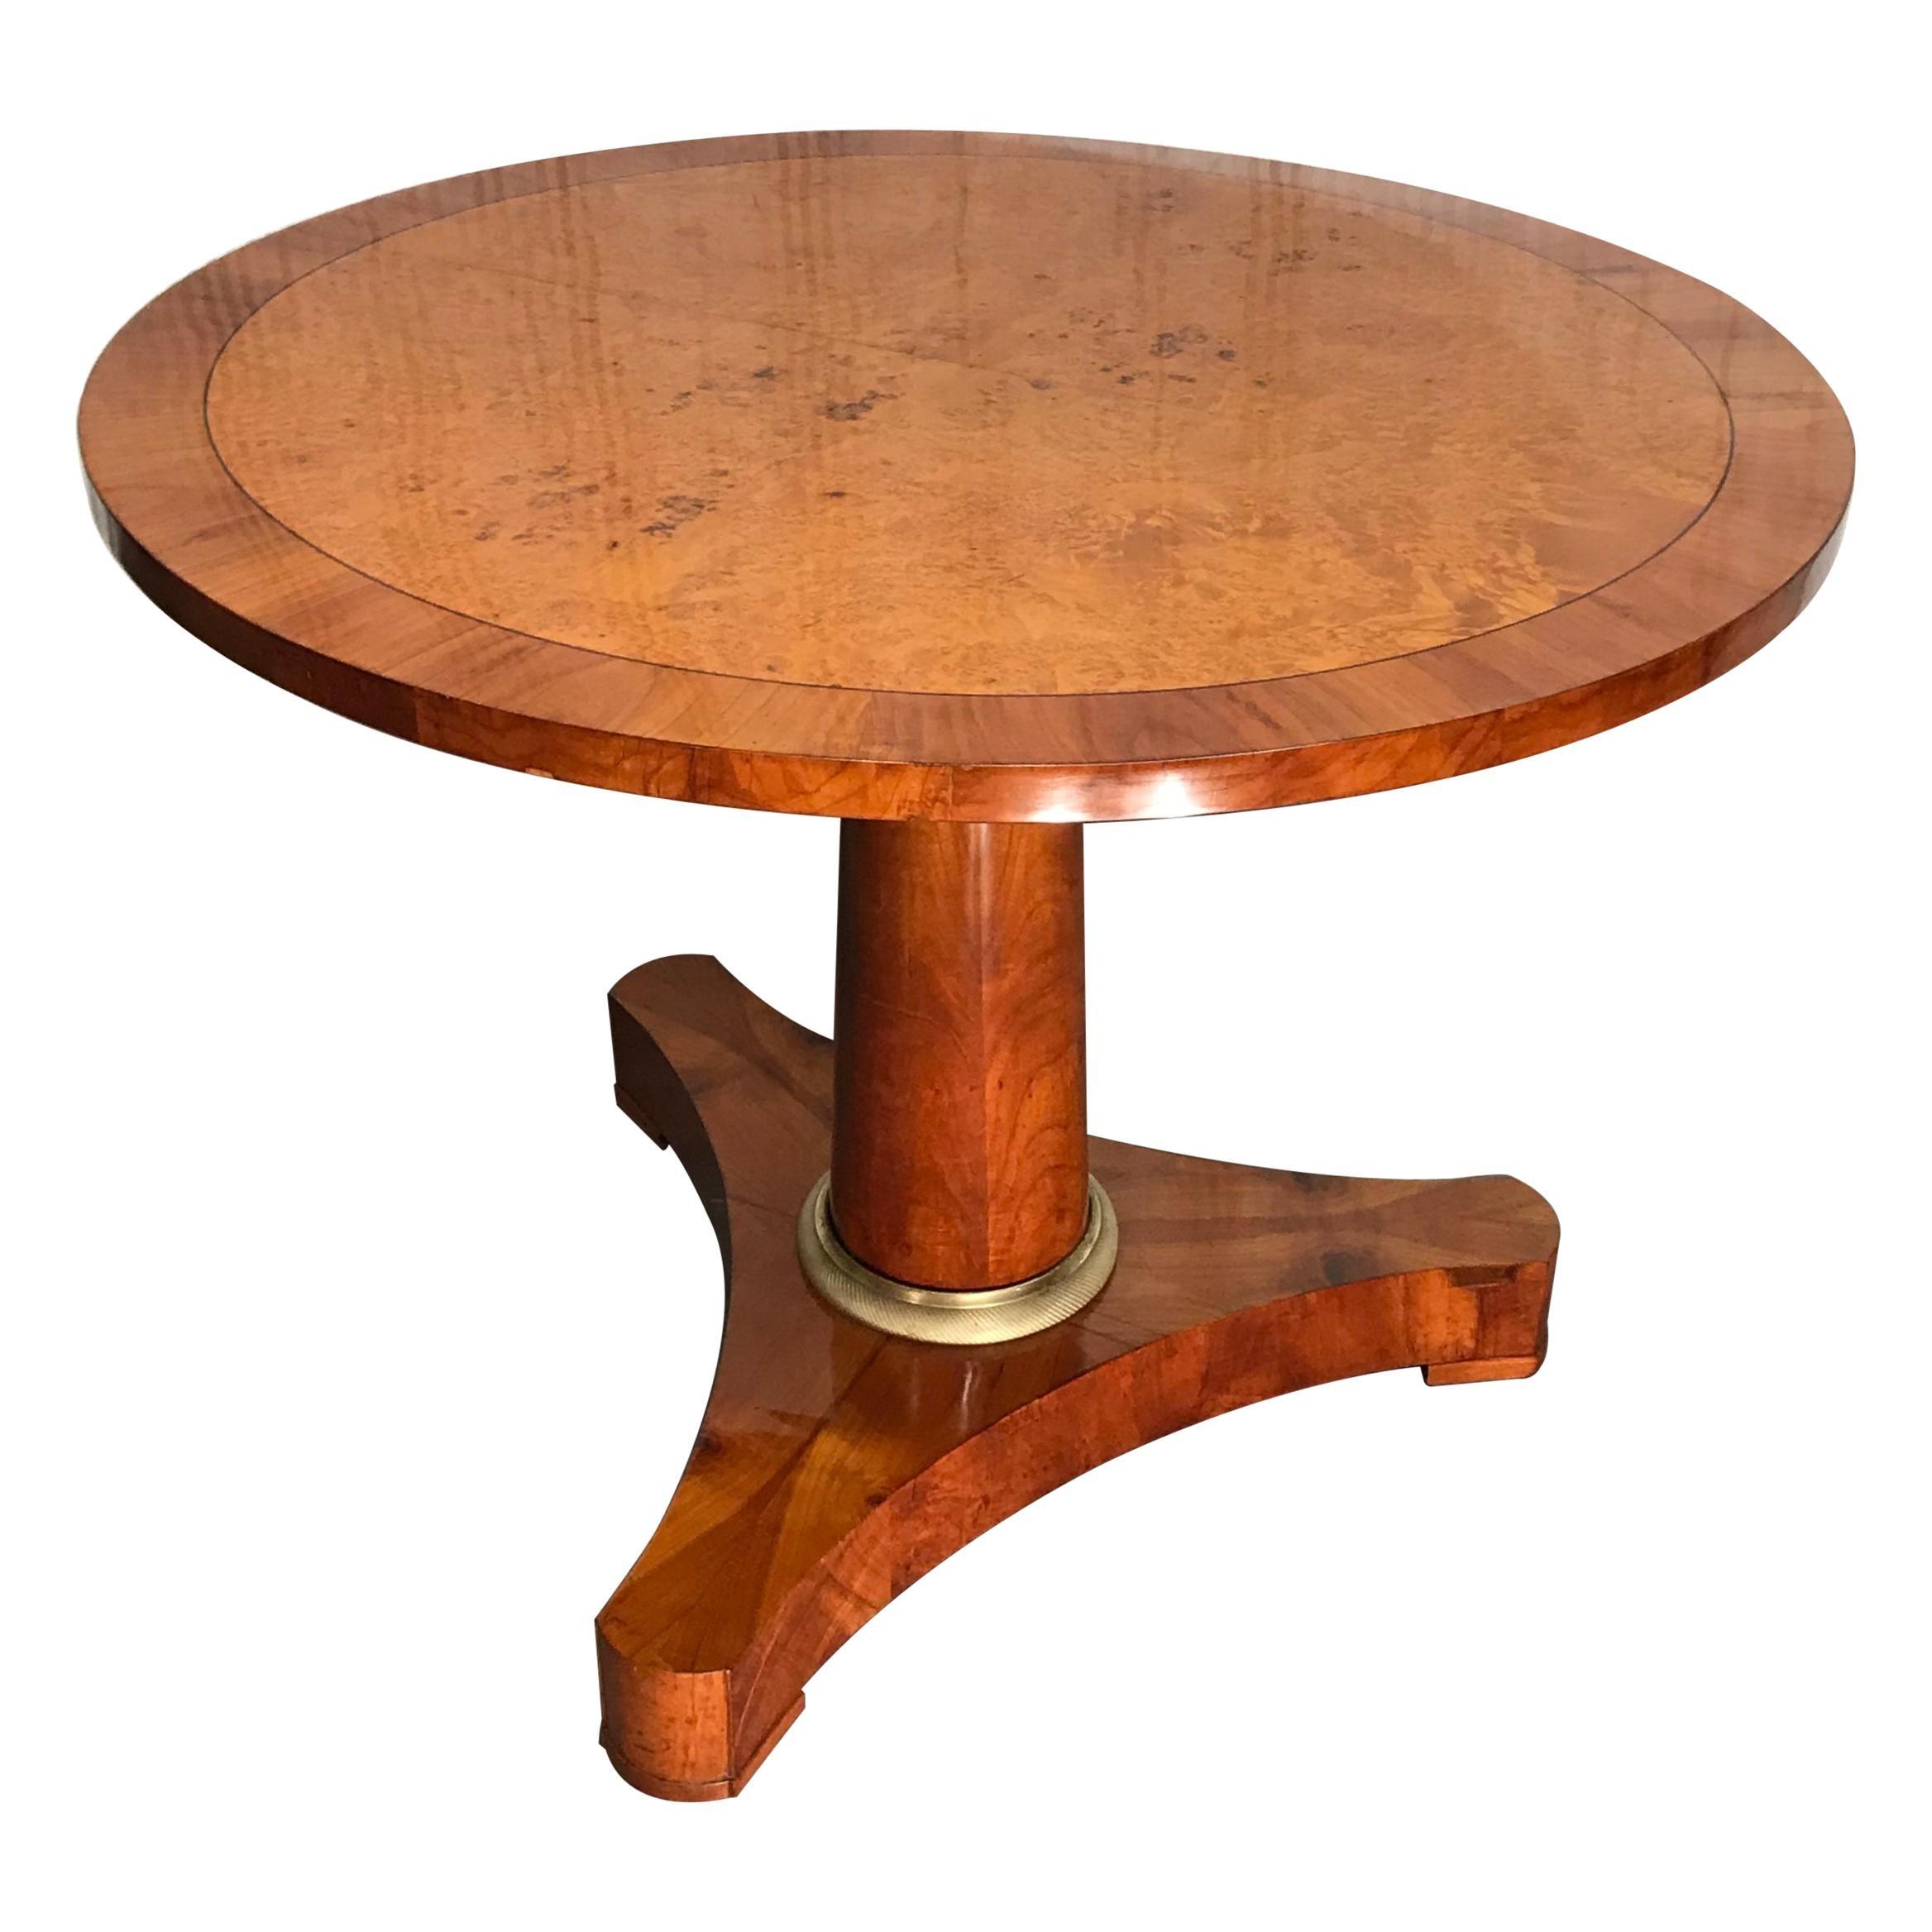 Biedermeier Table, Germany, 1830